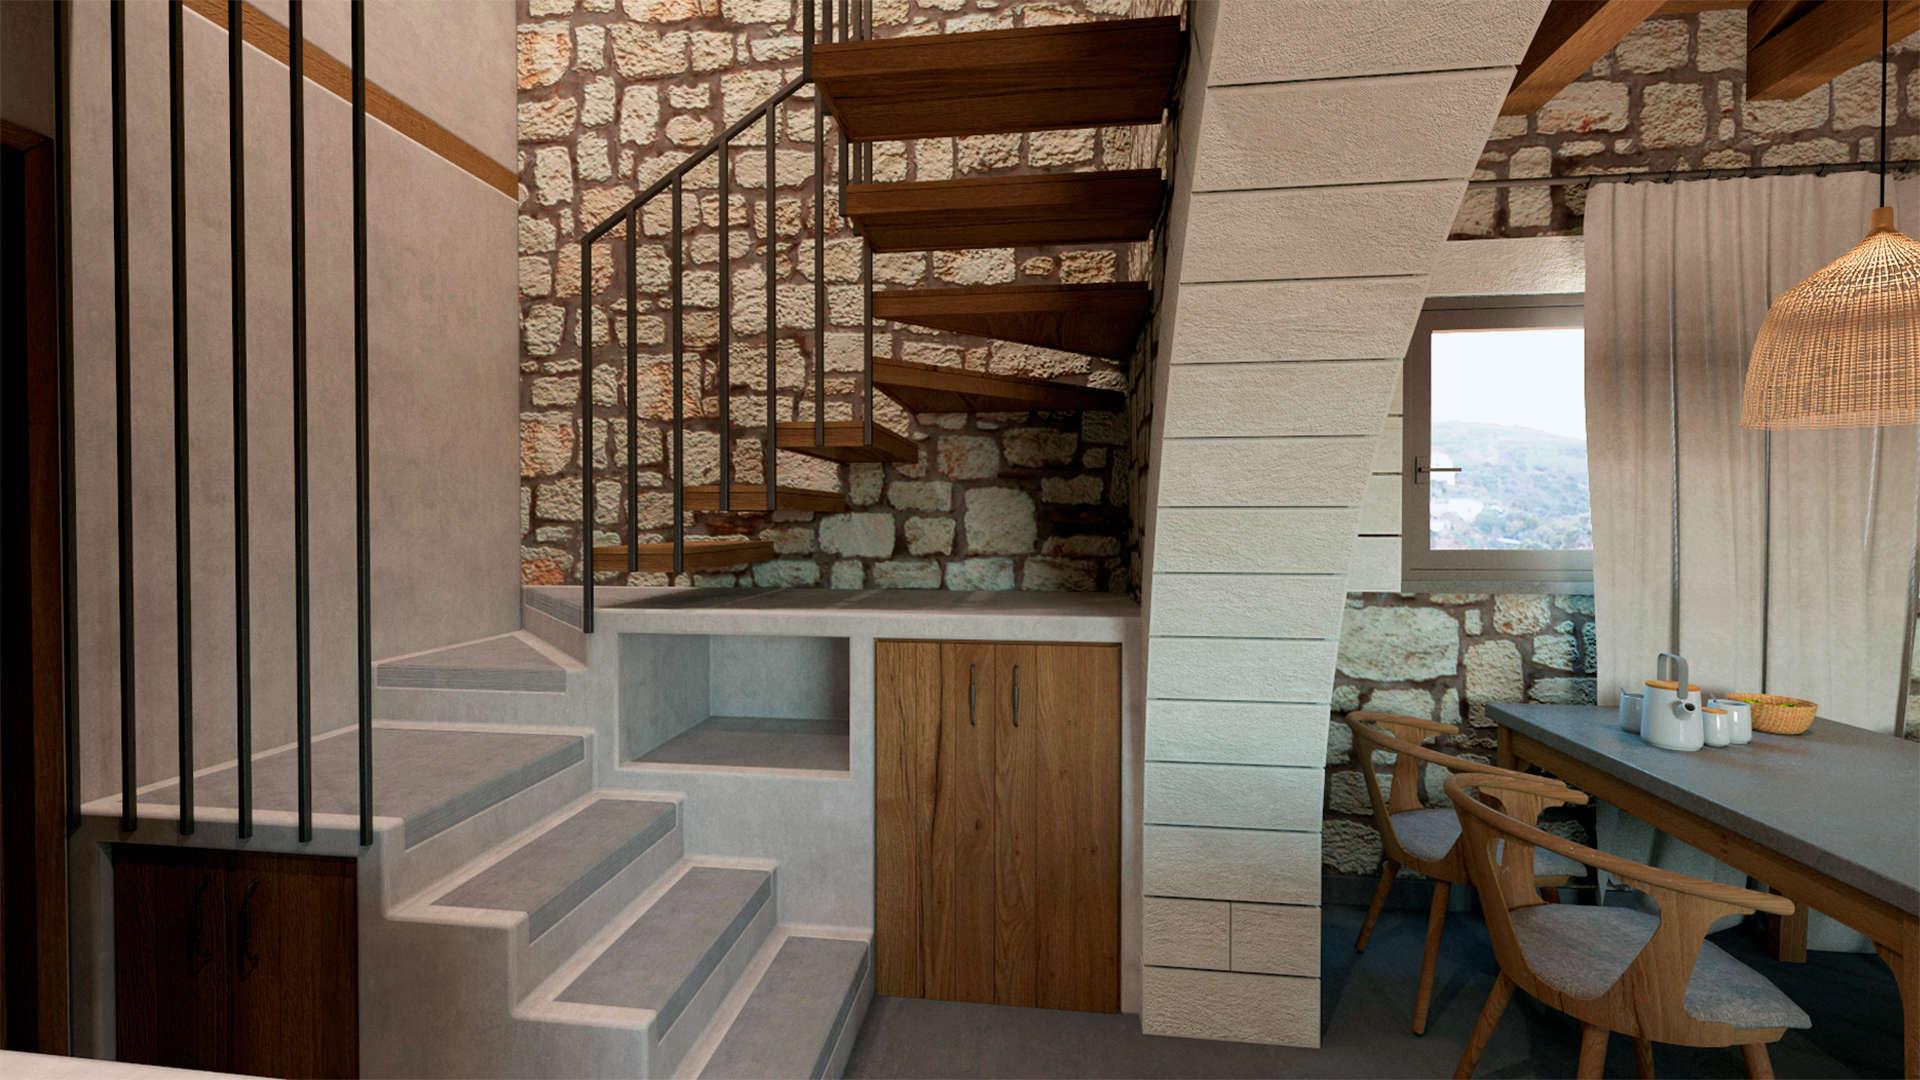 Holiday home, interior design, dining room, stairs. Παραθεριστική κατοικία, εσωτερικοί χώροι,τραπεζαρία, σκάλα.